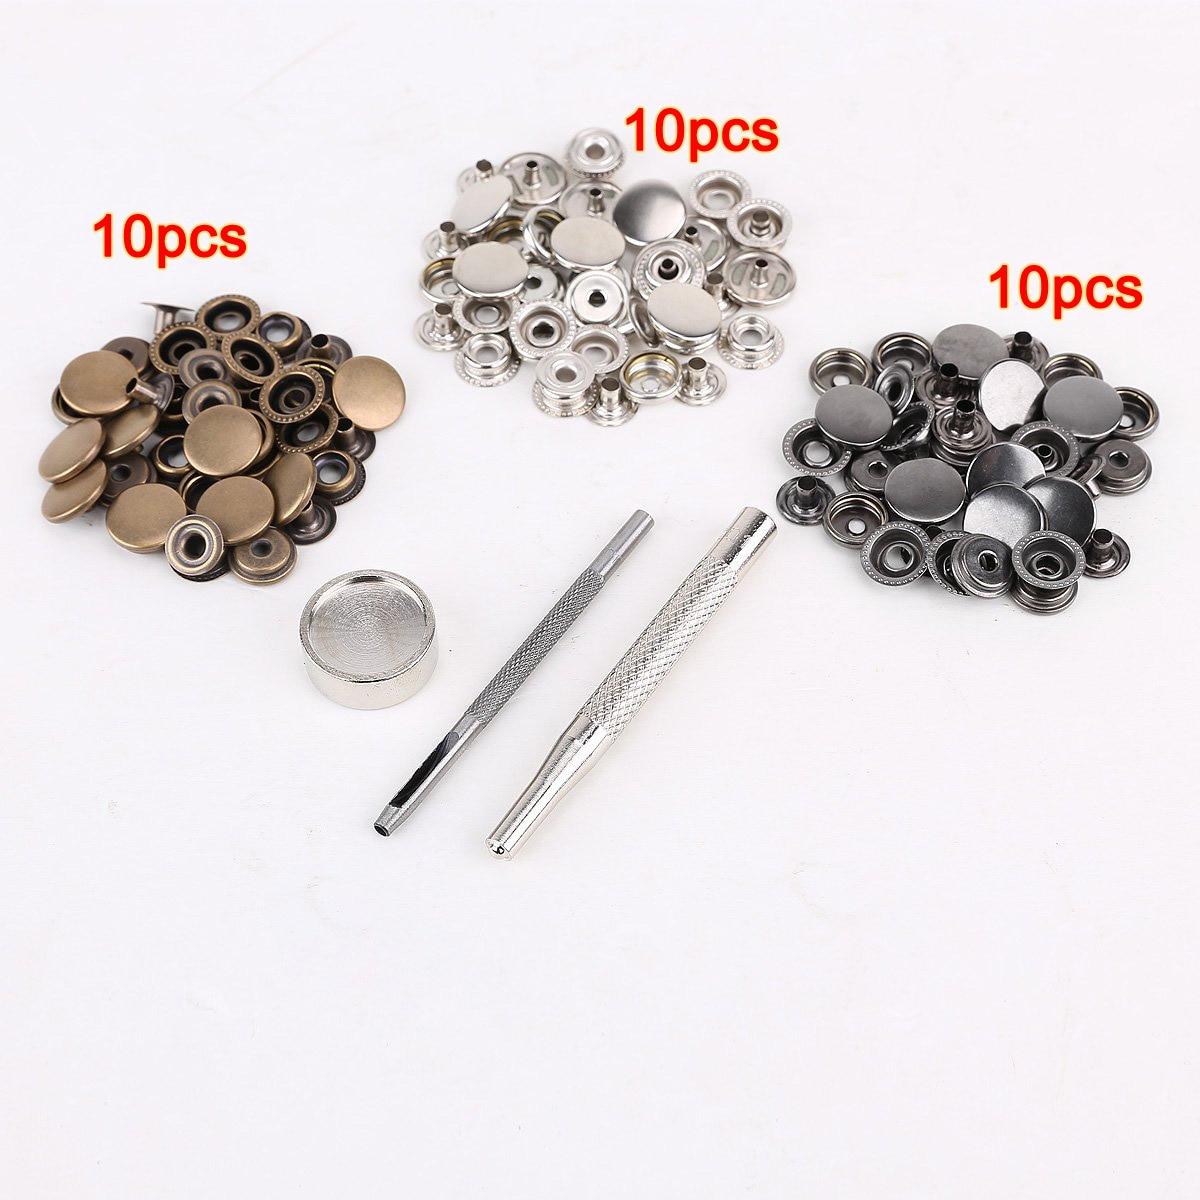 Hot Sale 25pcs Silver 25 Pcs Bronze 10mm Snap Button Metal Tool Set For Leather Handbags Fast Color